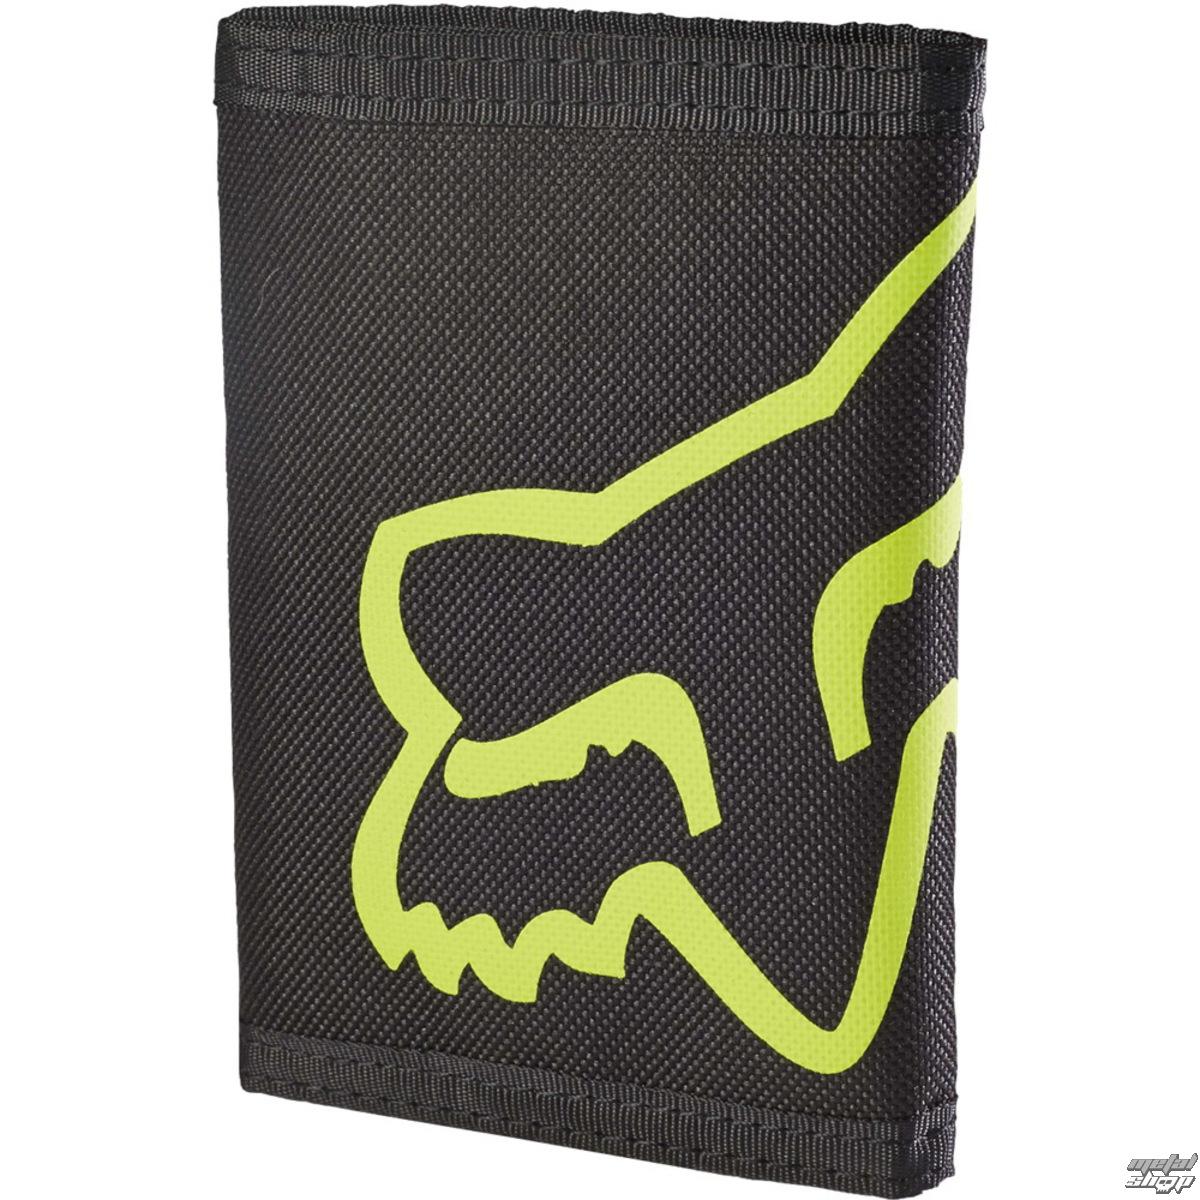 peněženka FOX - Verve Velcro - Black - 20161-001